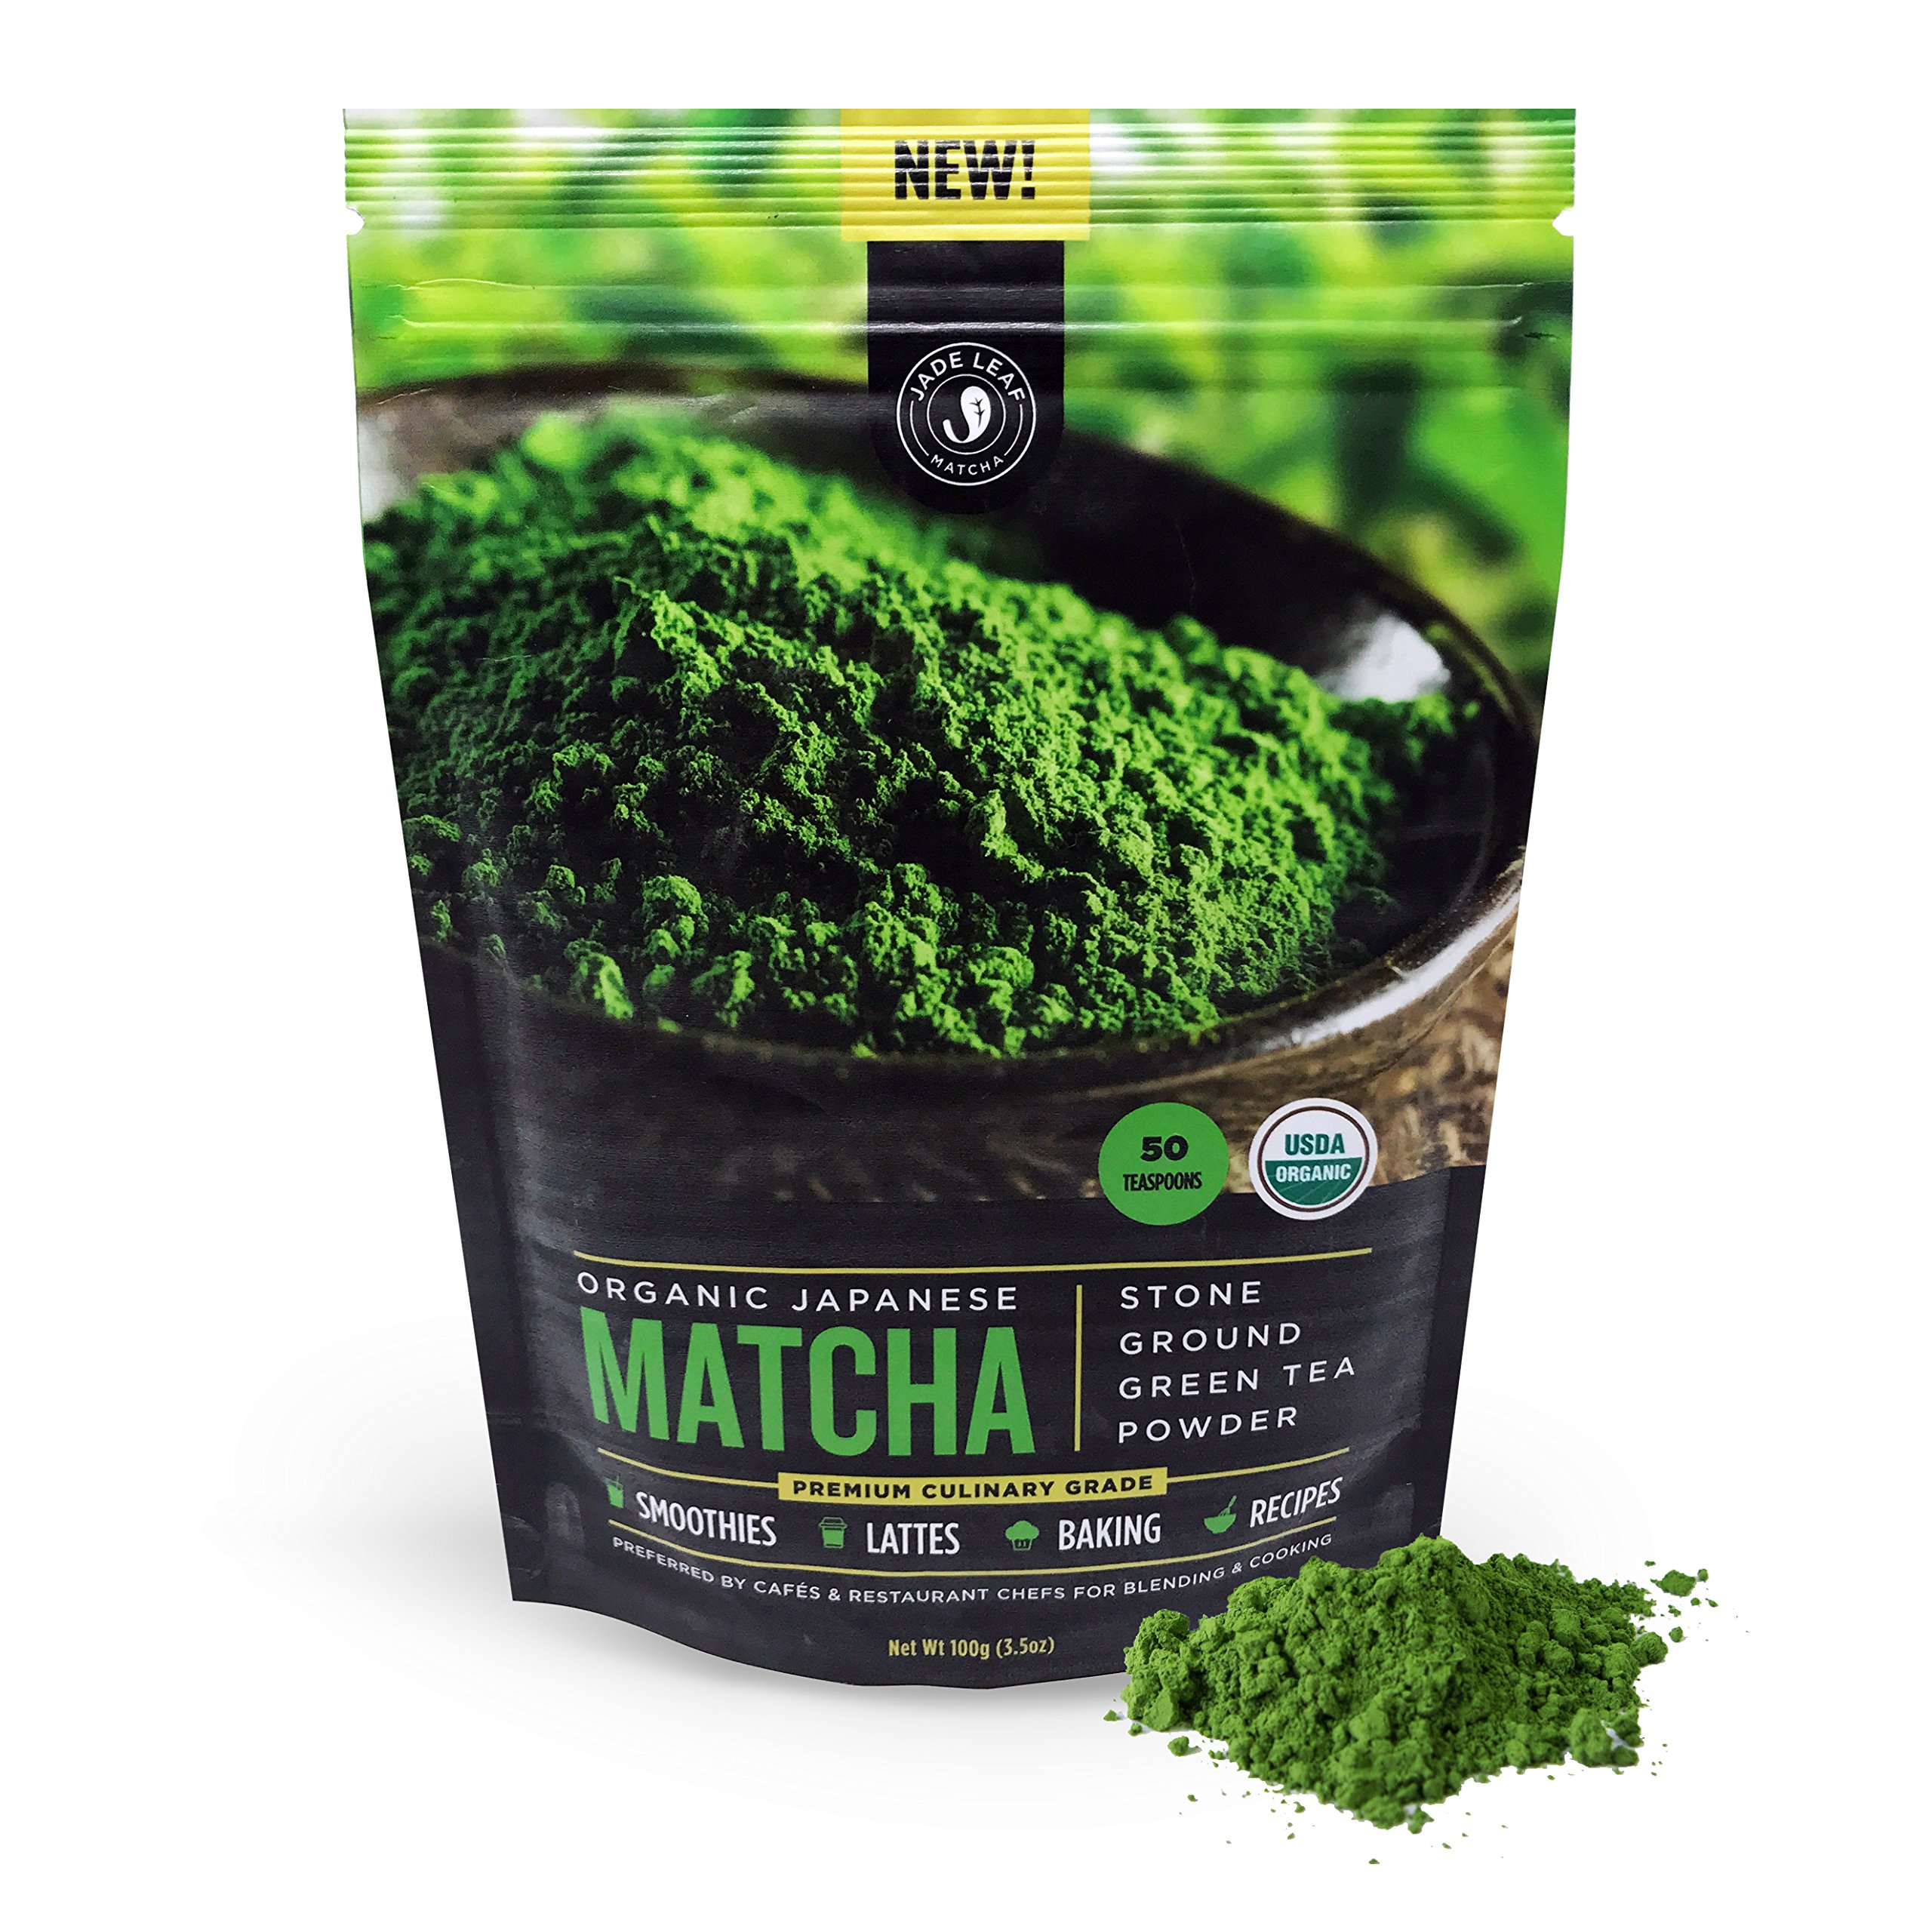 Jade Leaf Matcha Green Tea Powder - USDA Organic, Authentic Japanese Origin - Premium Culinary Grade (Smoothies, Lattes, Baking, Recipes) - Antioxidants, Energy [100g Value Size]